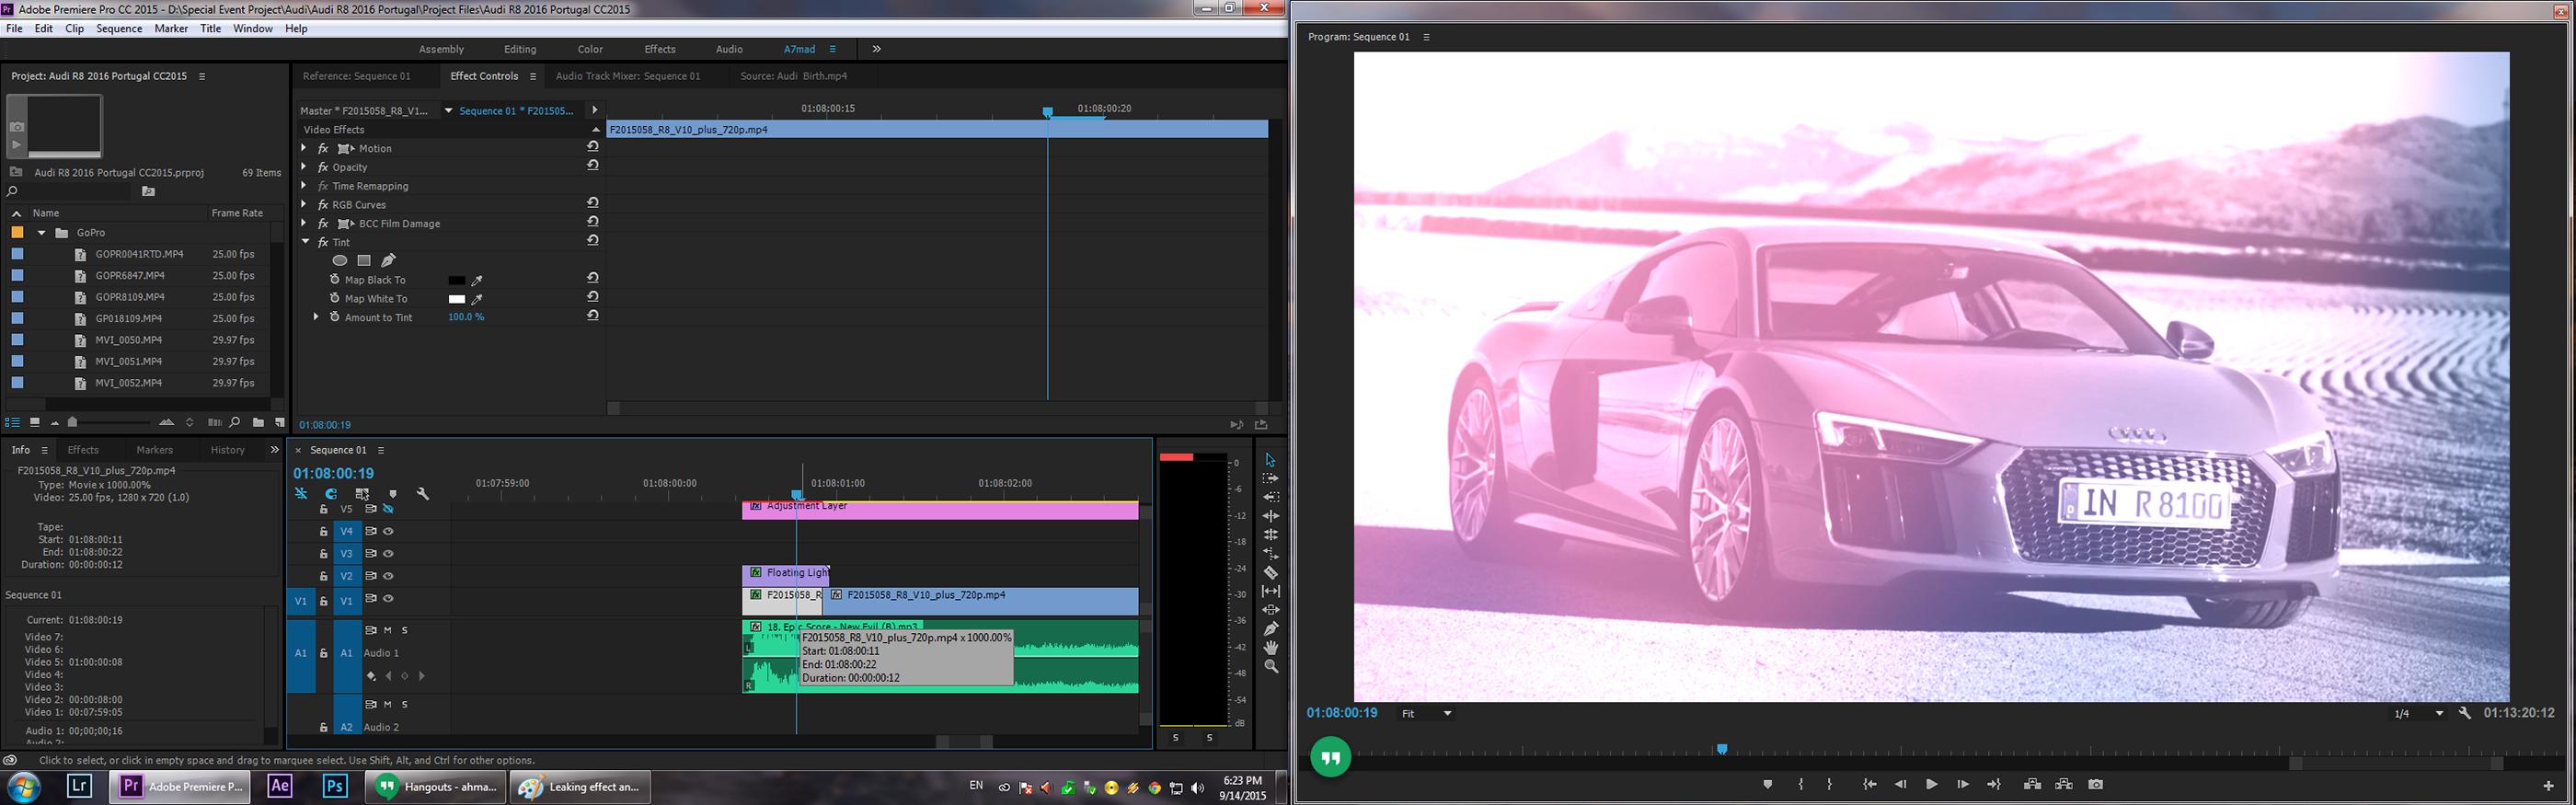 2016 Audi R8 Video Editing & Break Down on Behance